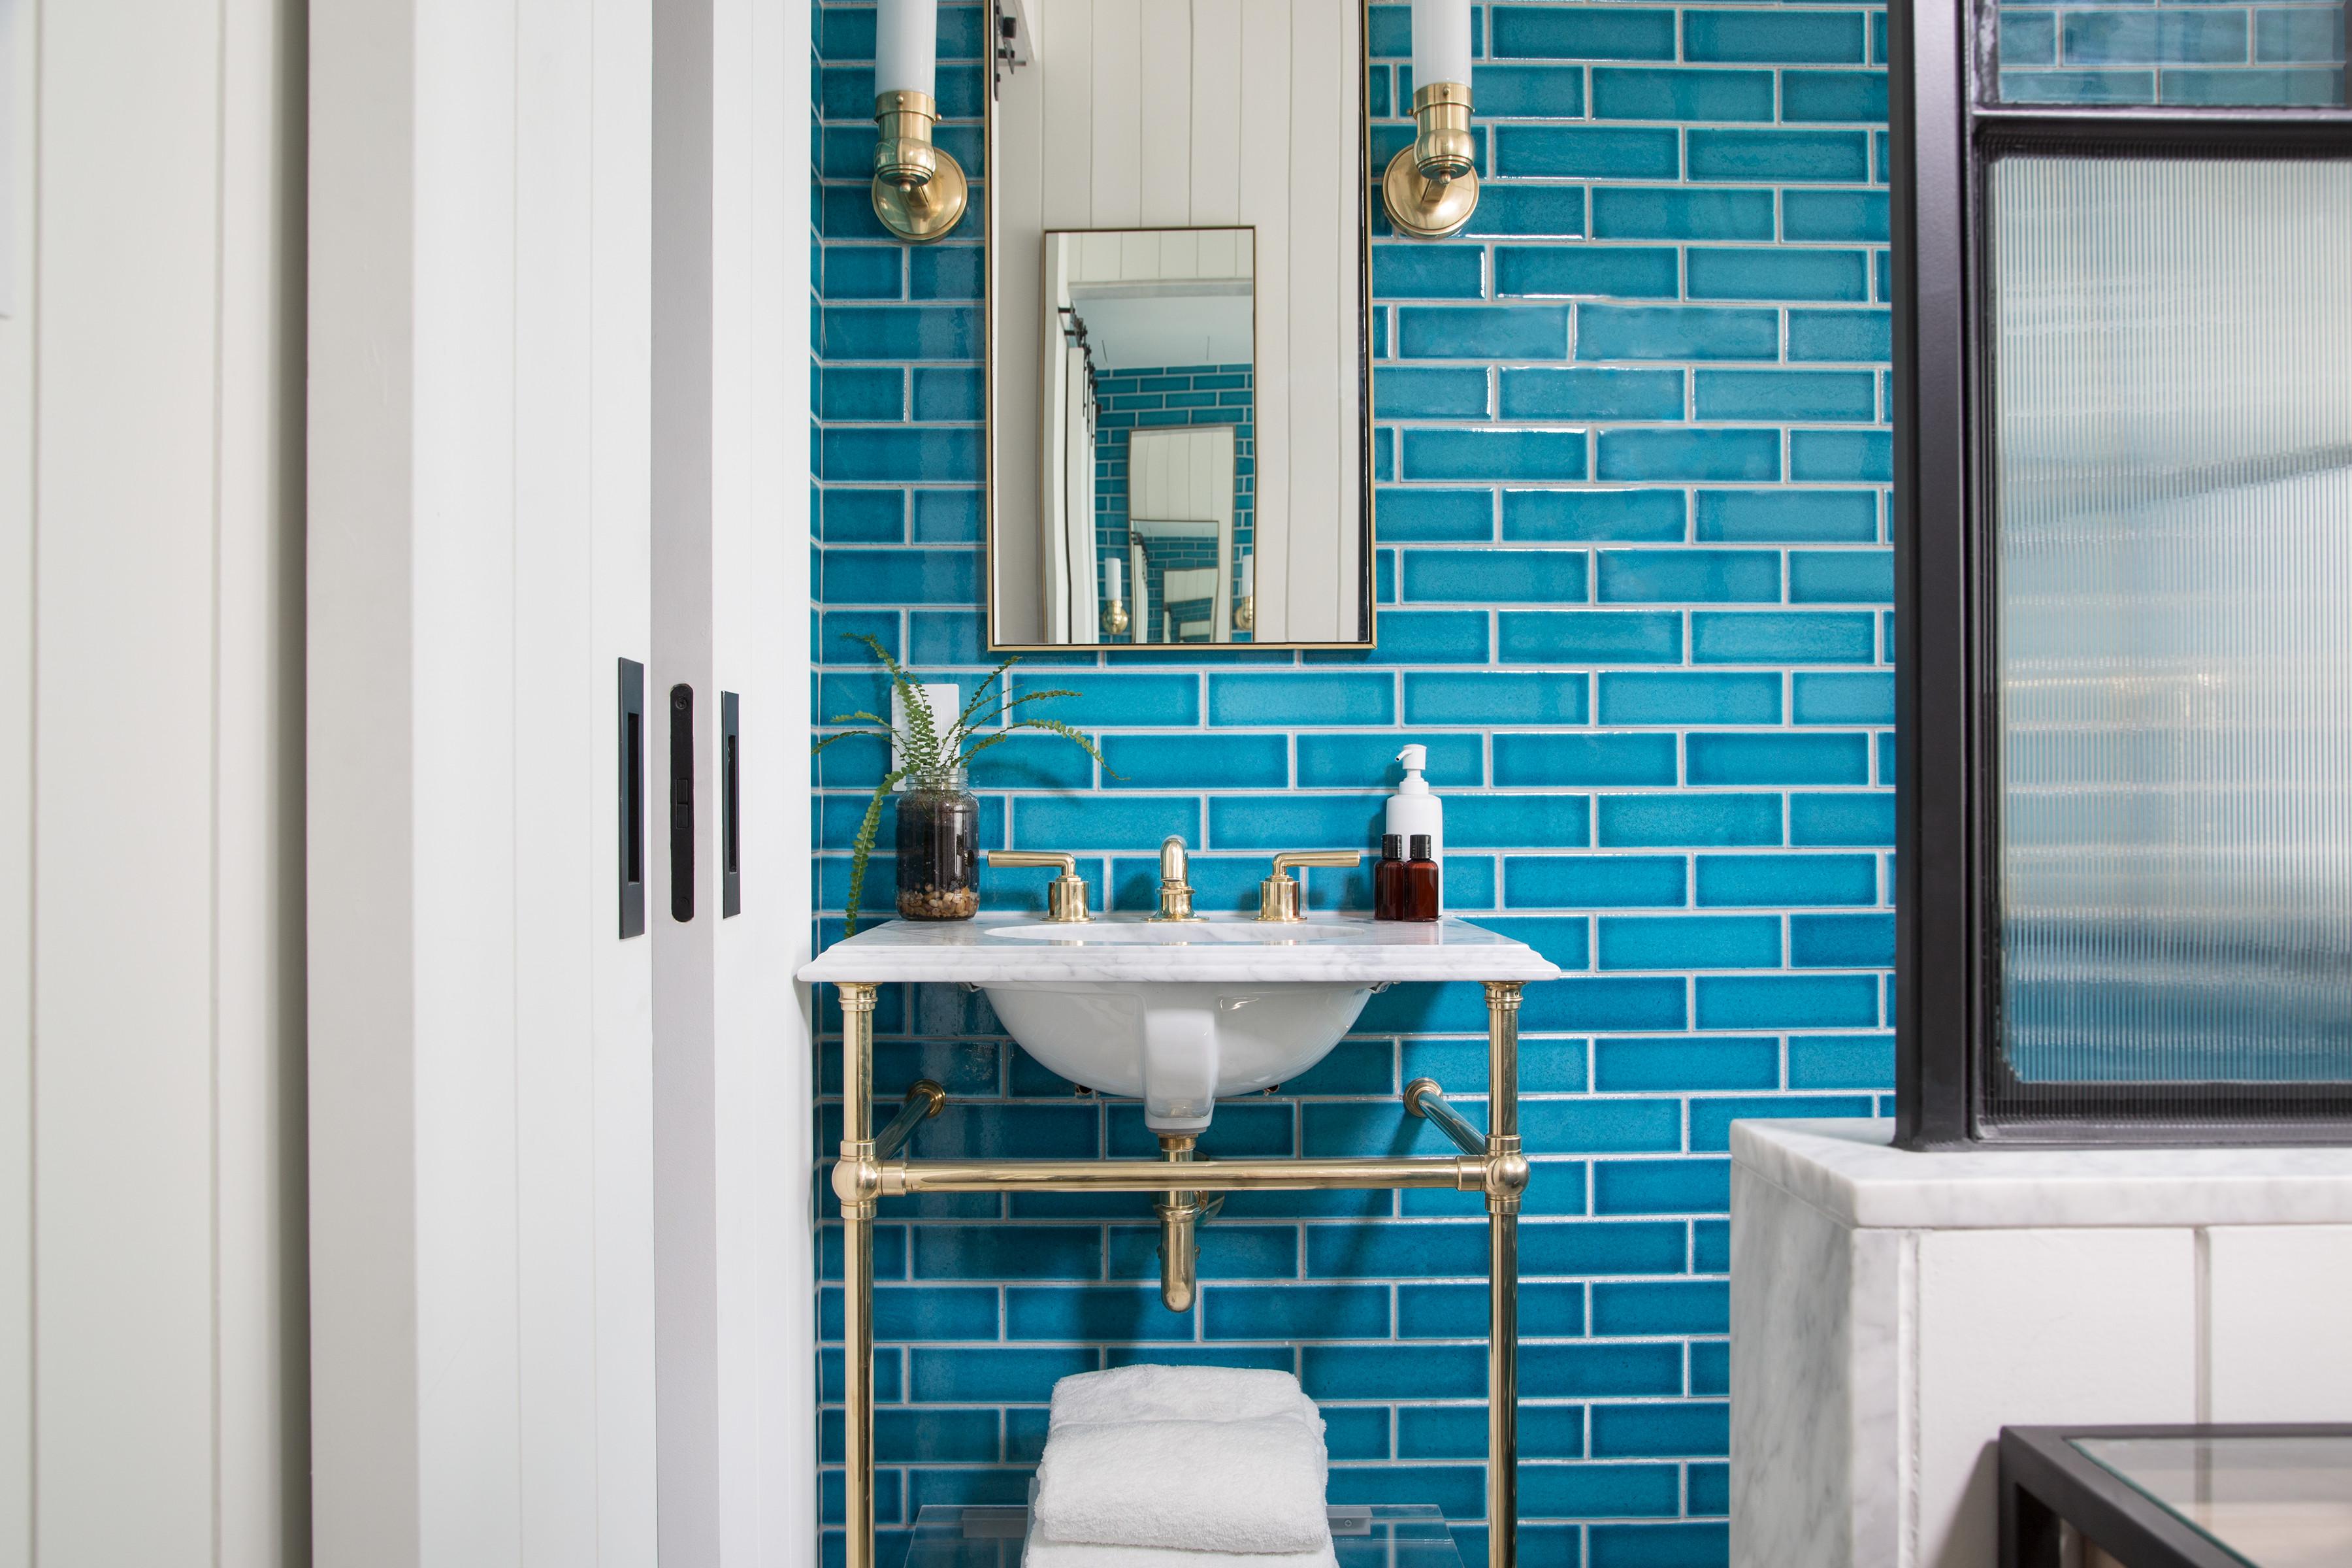 Le top 5 des tendances design pour une salle de bain de luxe for Salle bain hotel